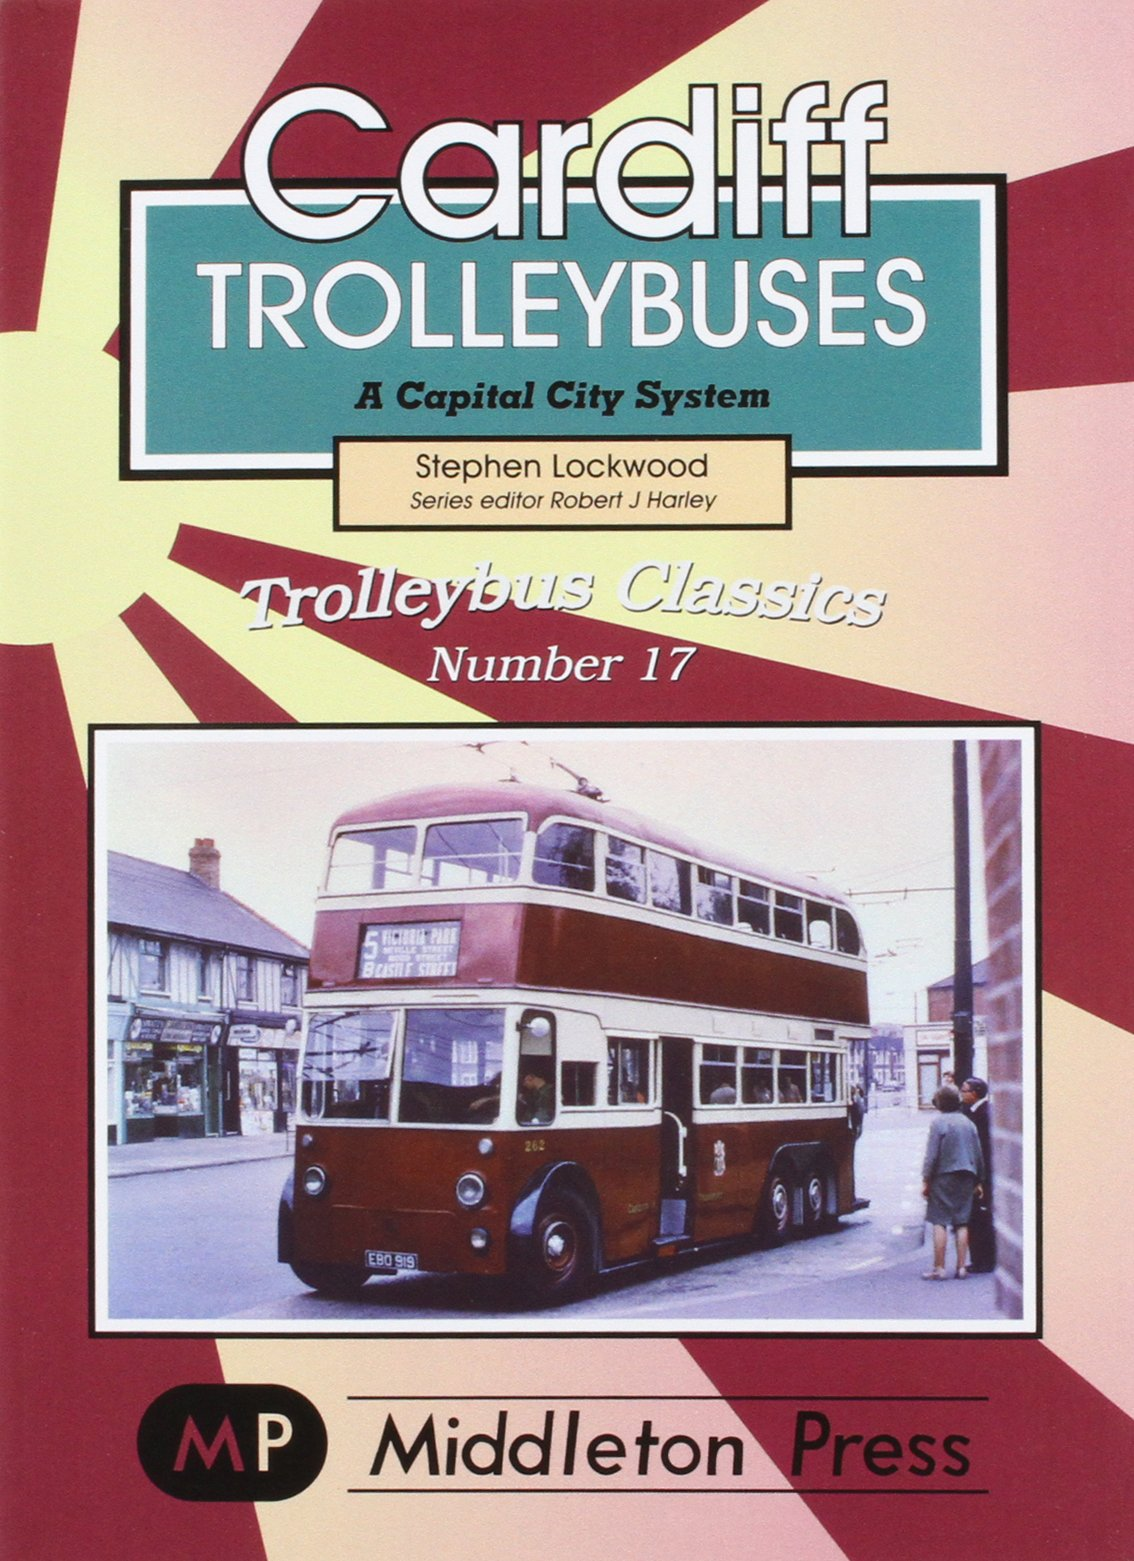 Cardiff Trolleybuses